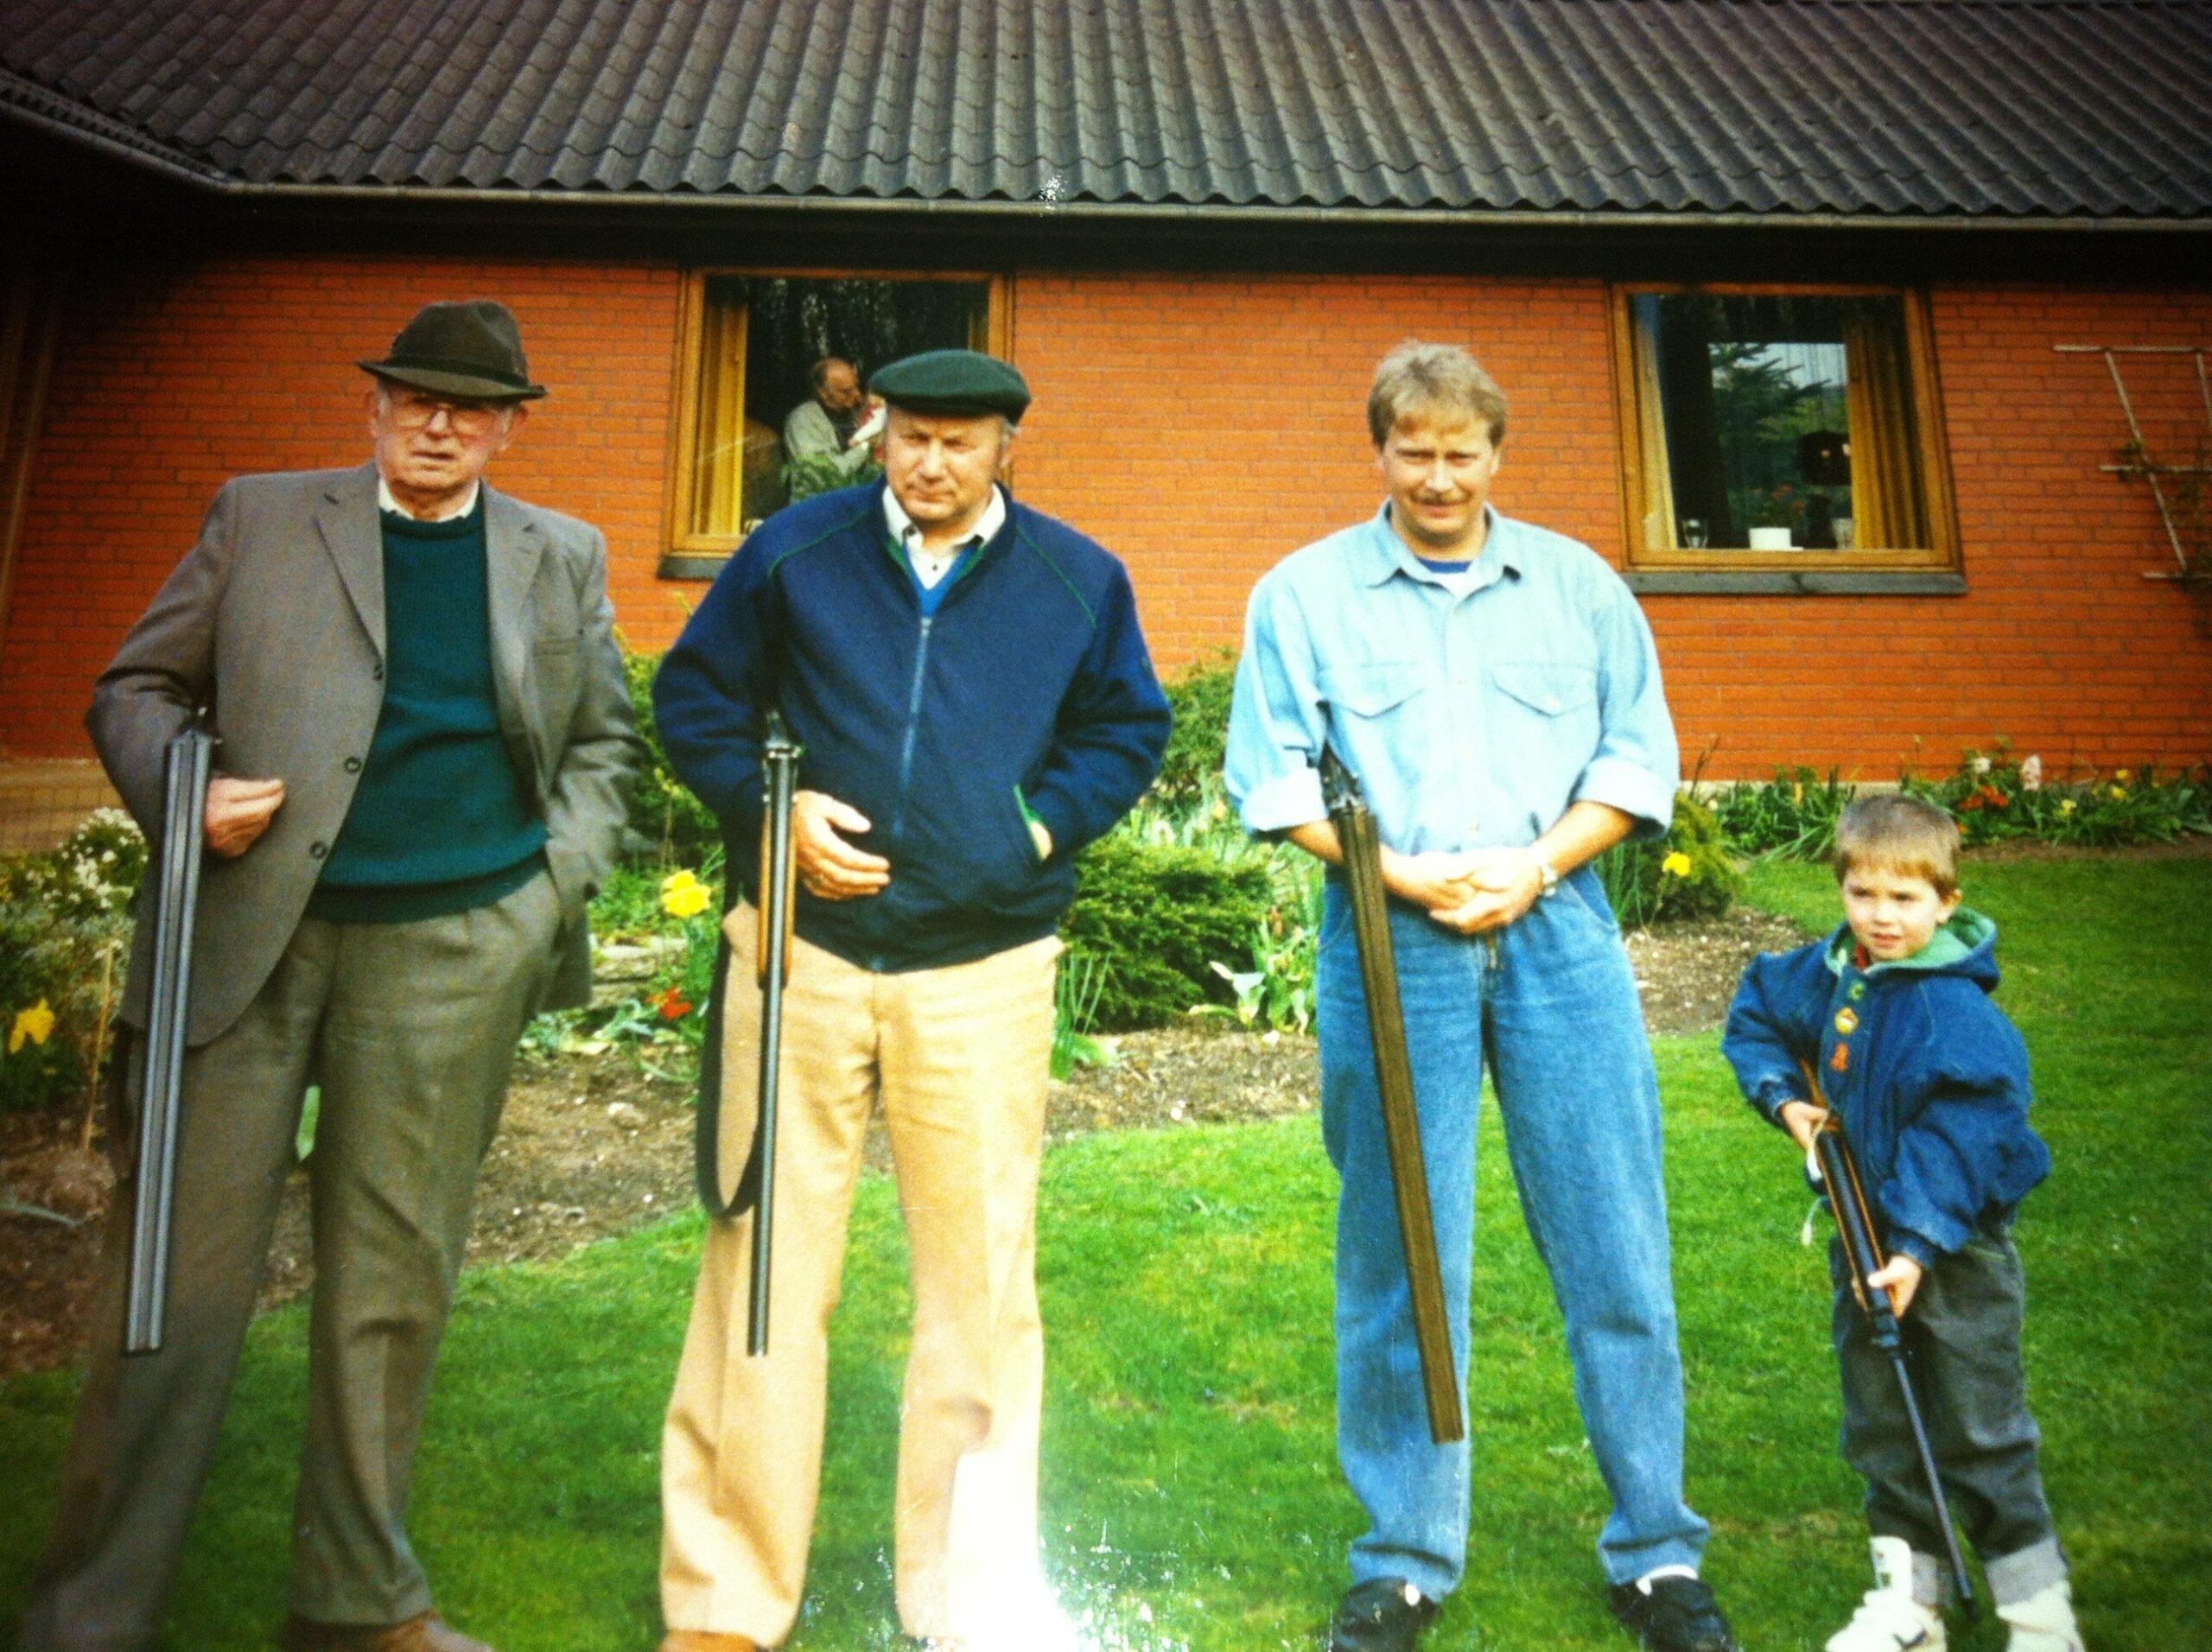 de 4 generationer